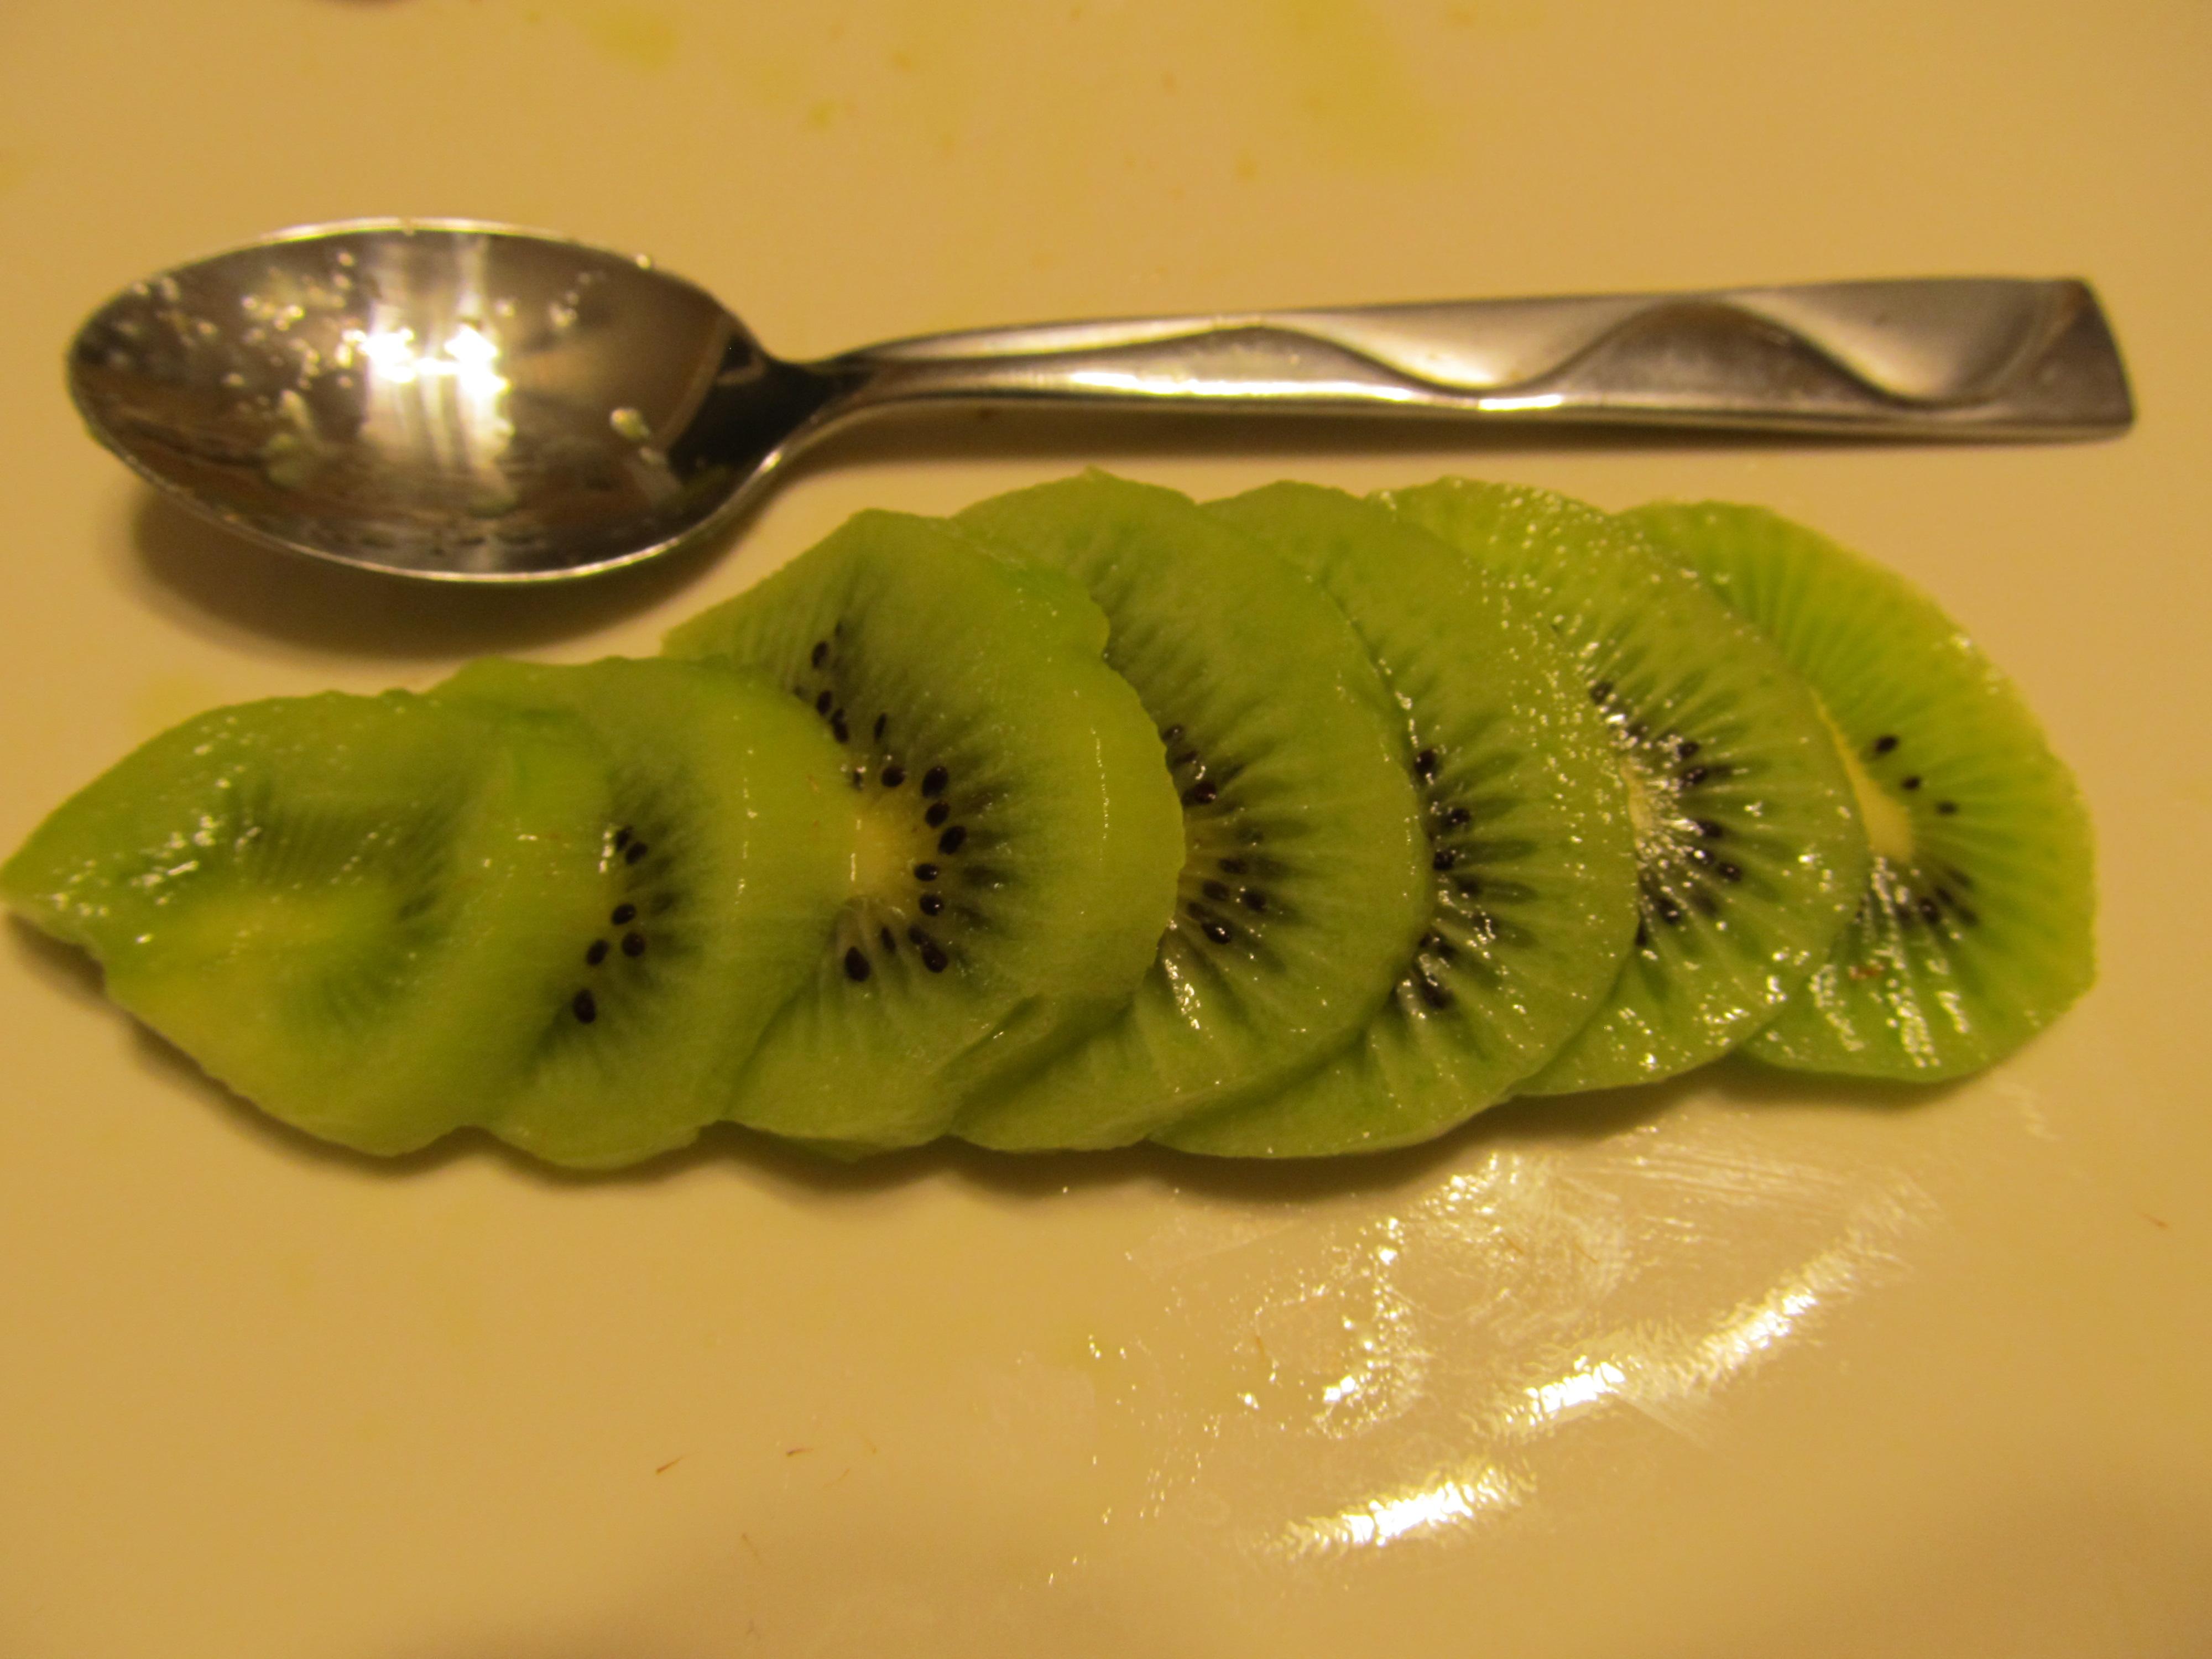 How to Peel a Kiwi using a Spoon